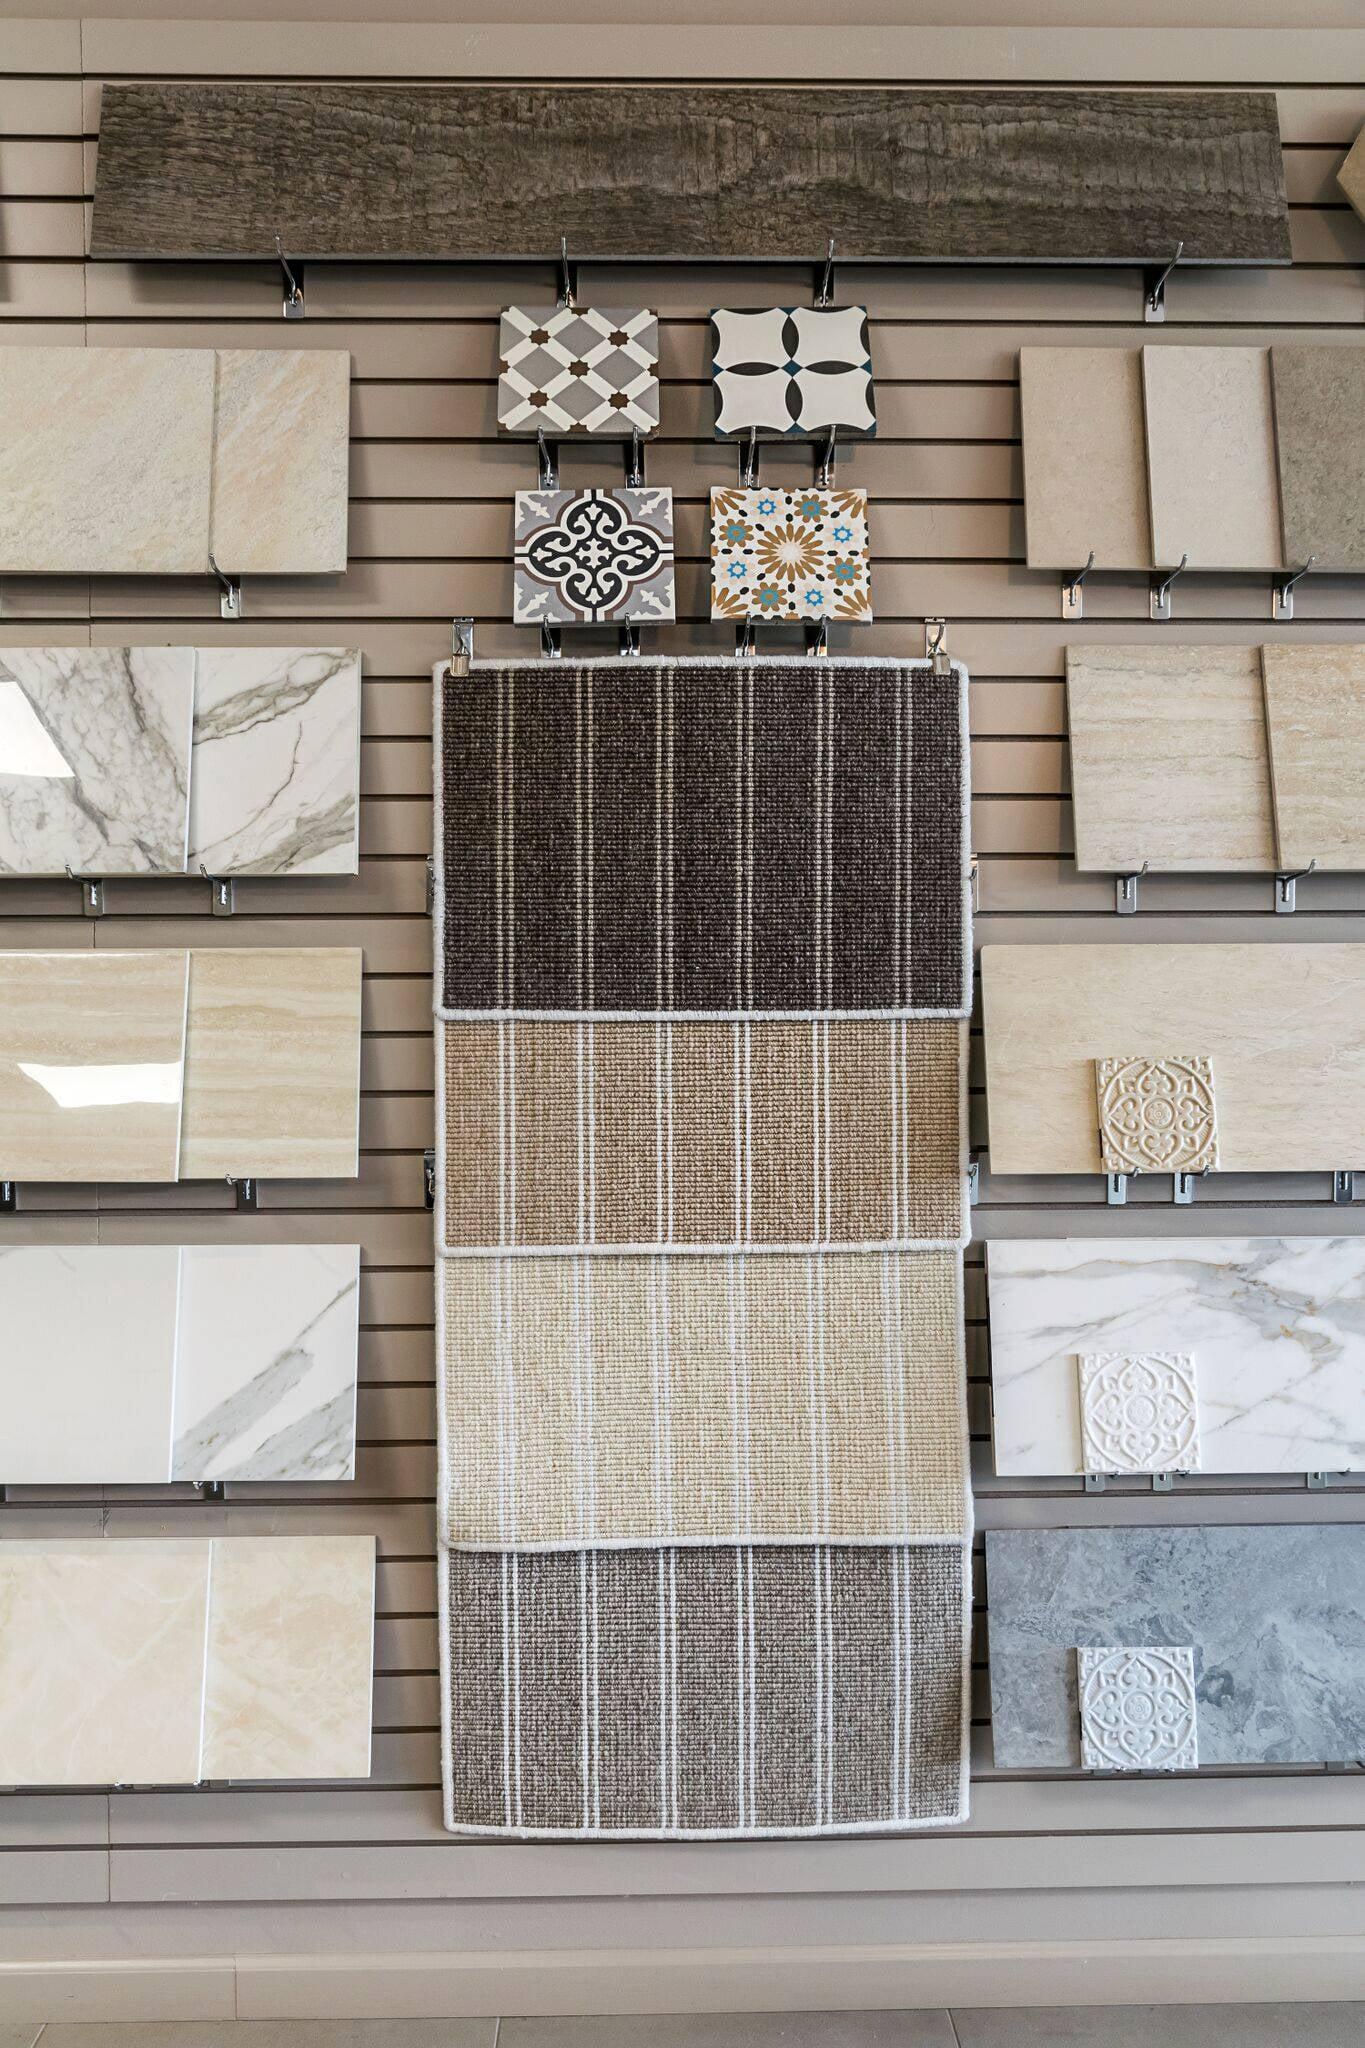 Floor Source showroom in Maryland Heights, MO